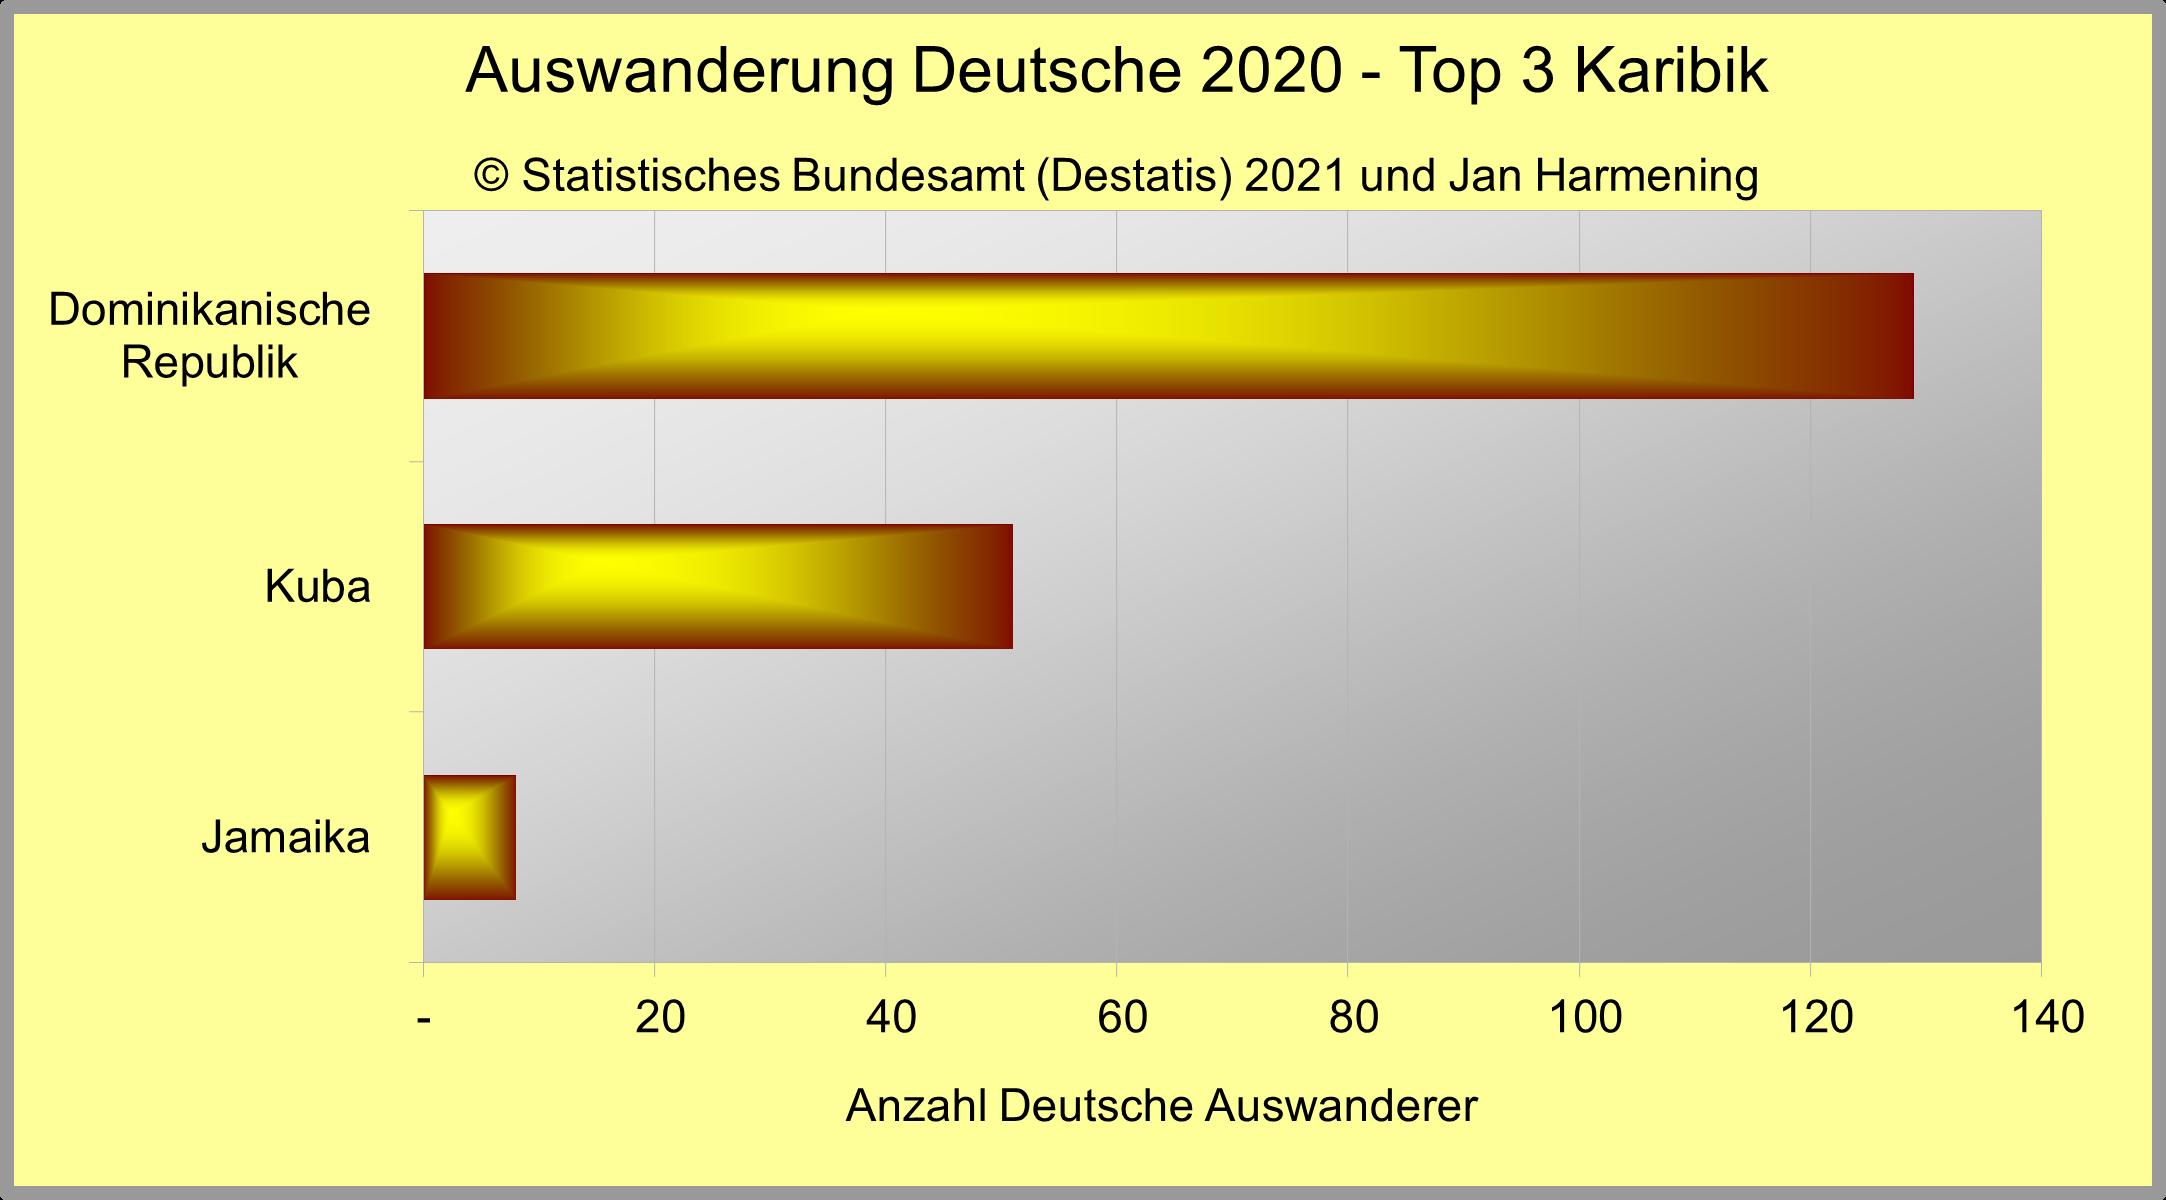 Auswanderung Deutsche 2020 - Top 3 Karibik